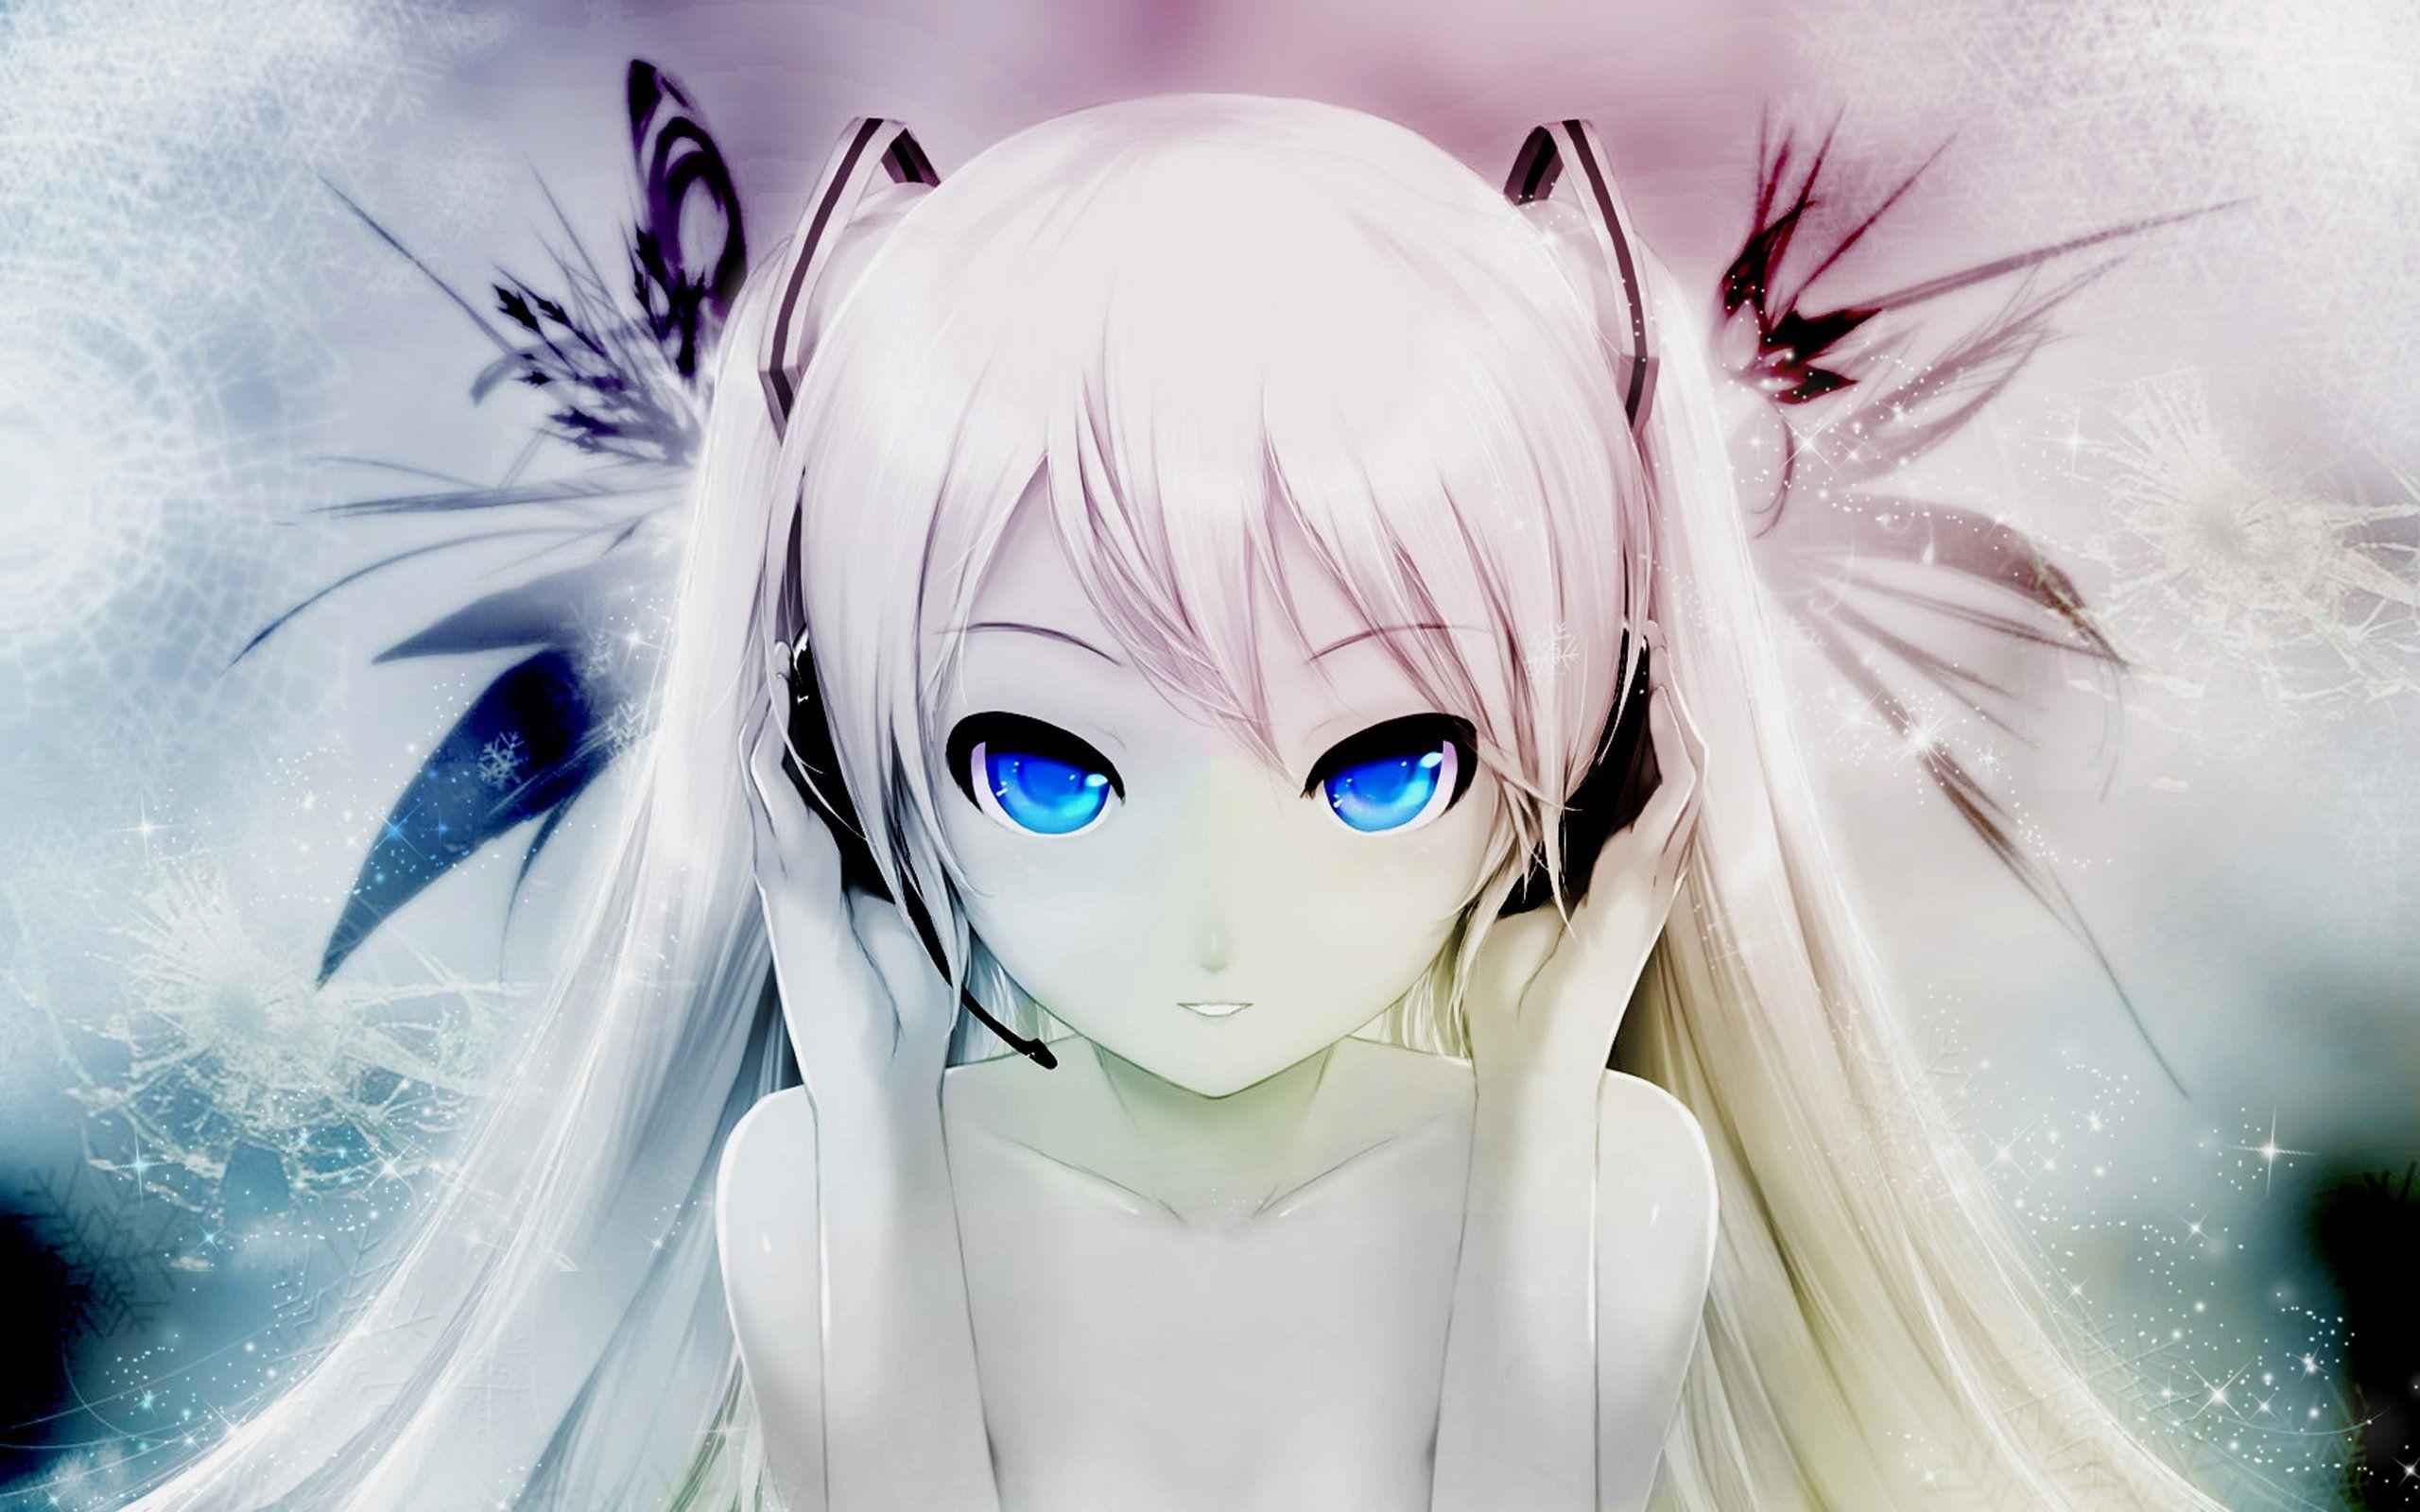 anime and manga wallpaper - Google Search | Anime/Manga ...